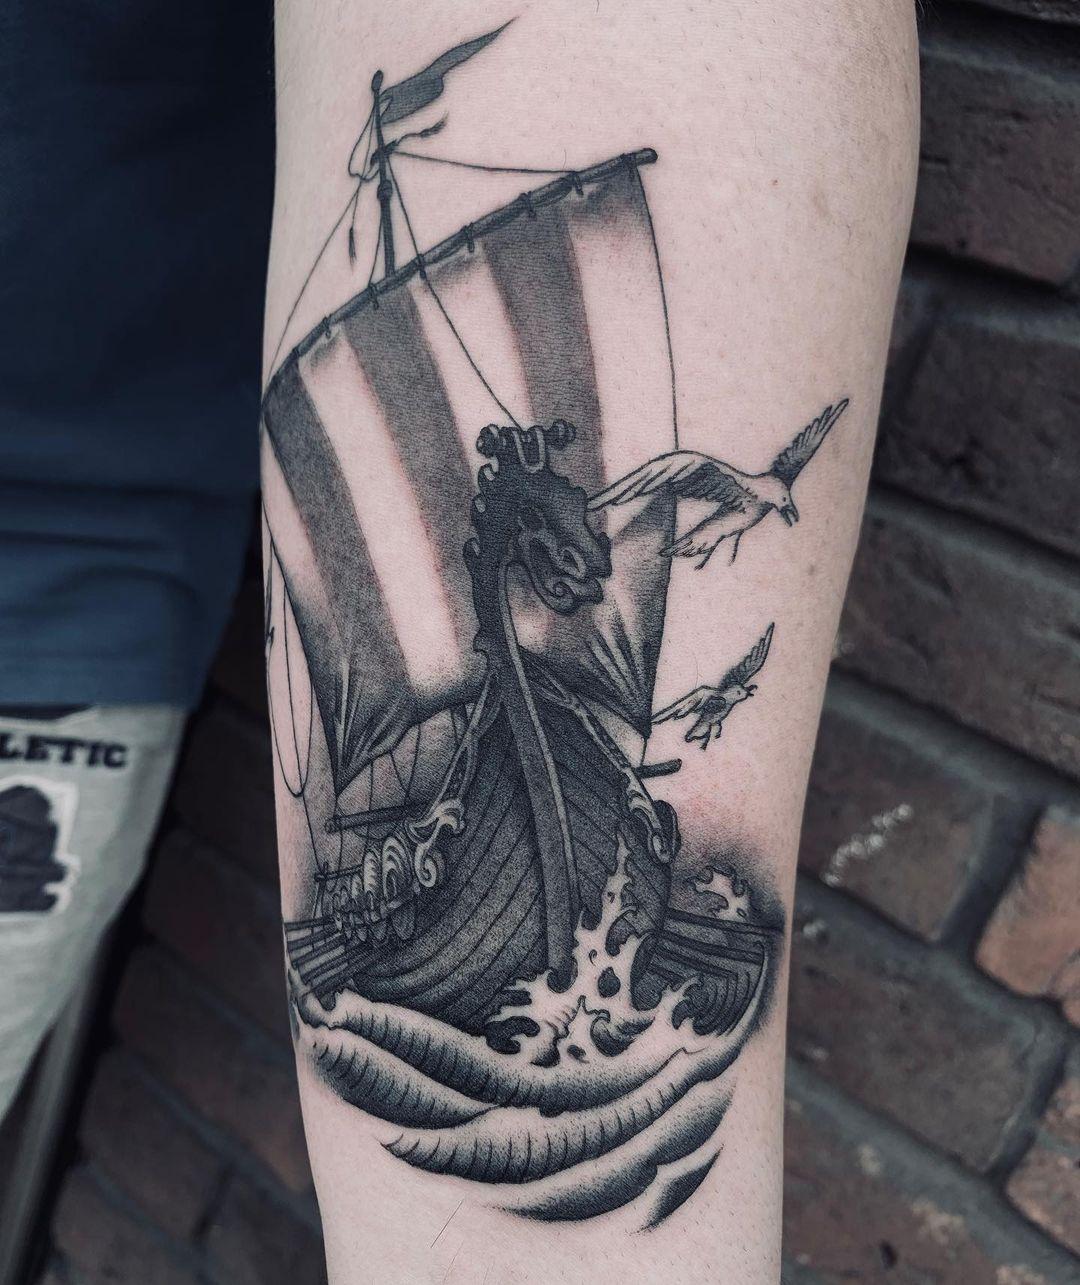 ür Termine November/ Dezember an:  matthias@zeitgeist-tattoo.com  Aktuell bin ic